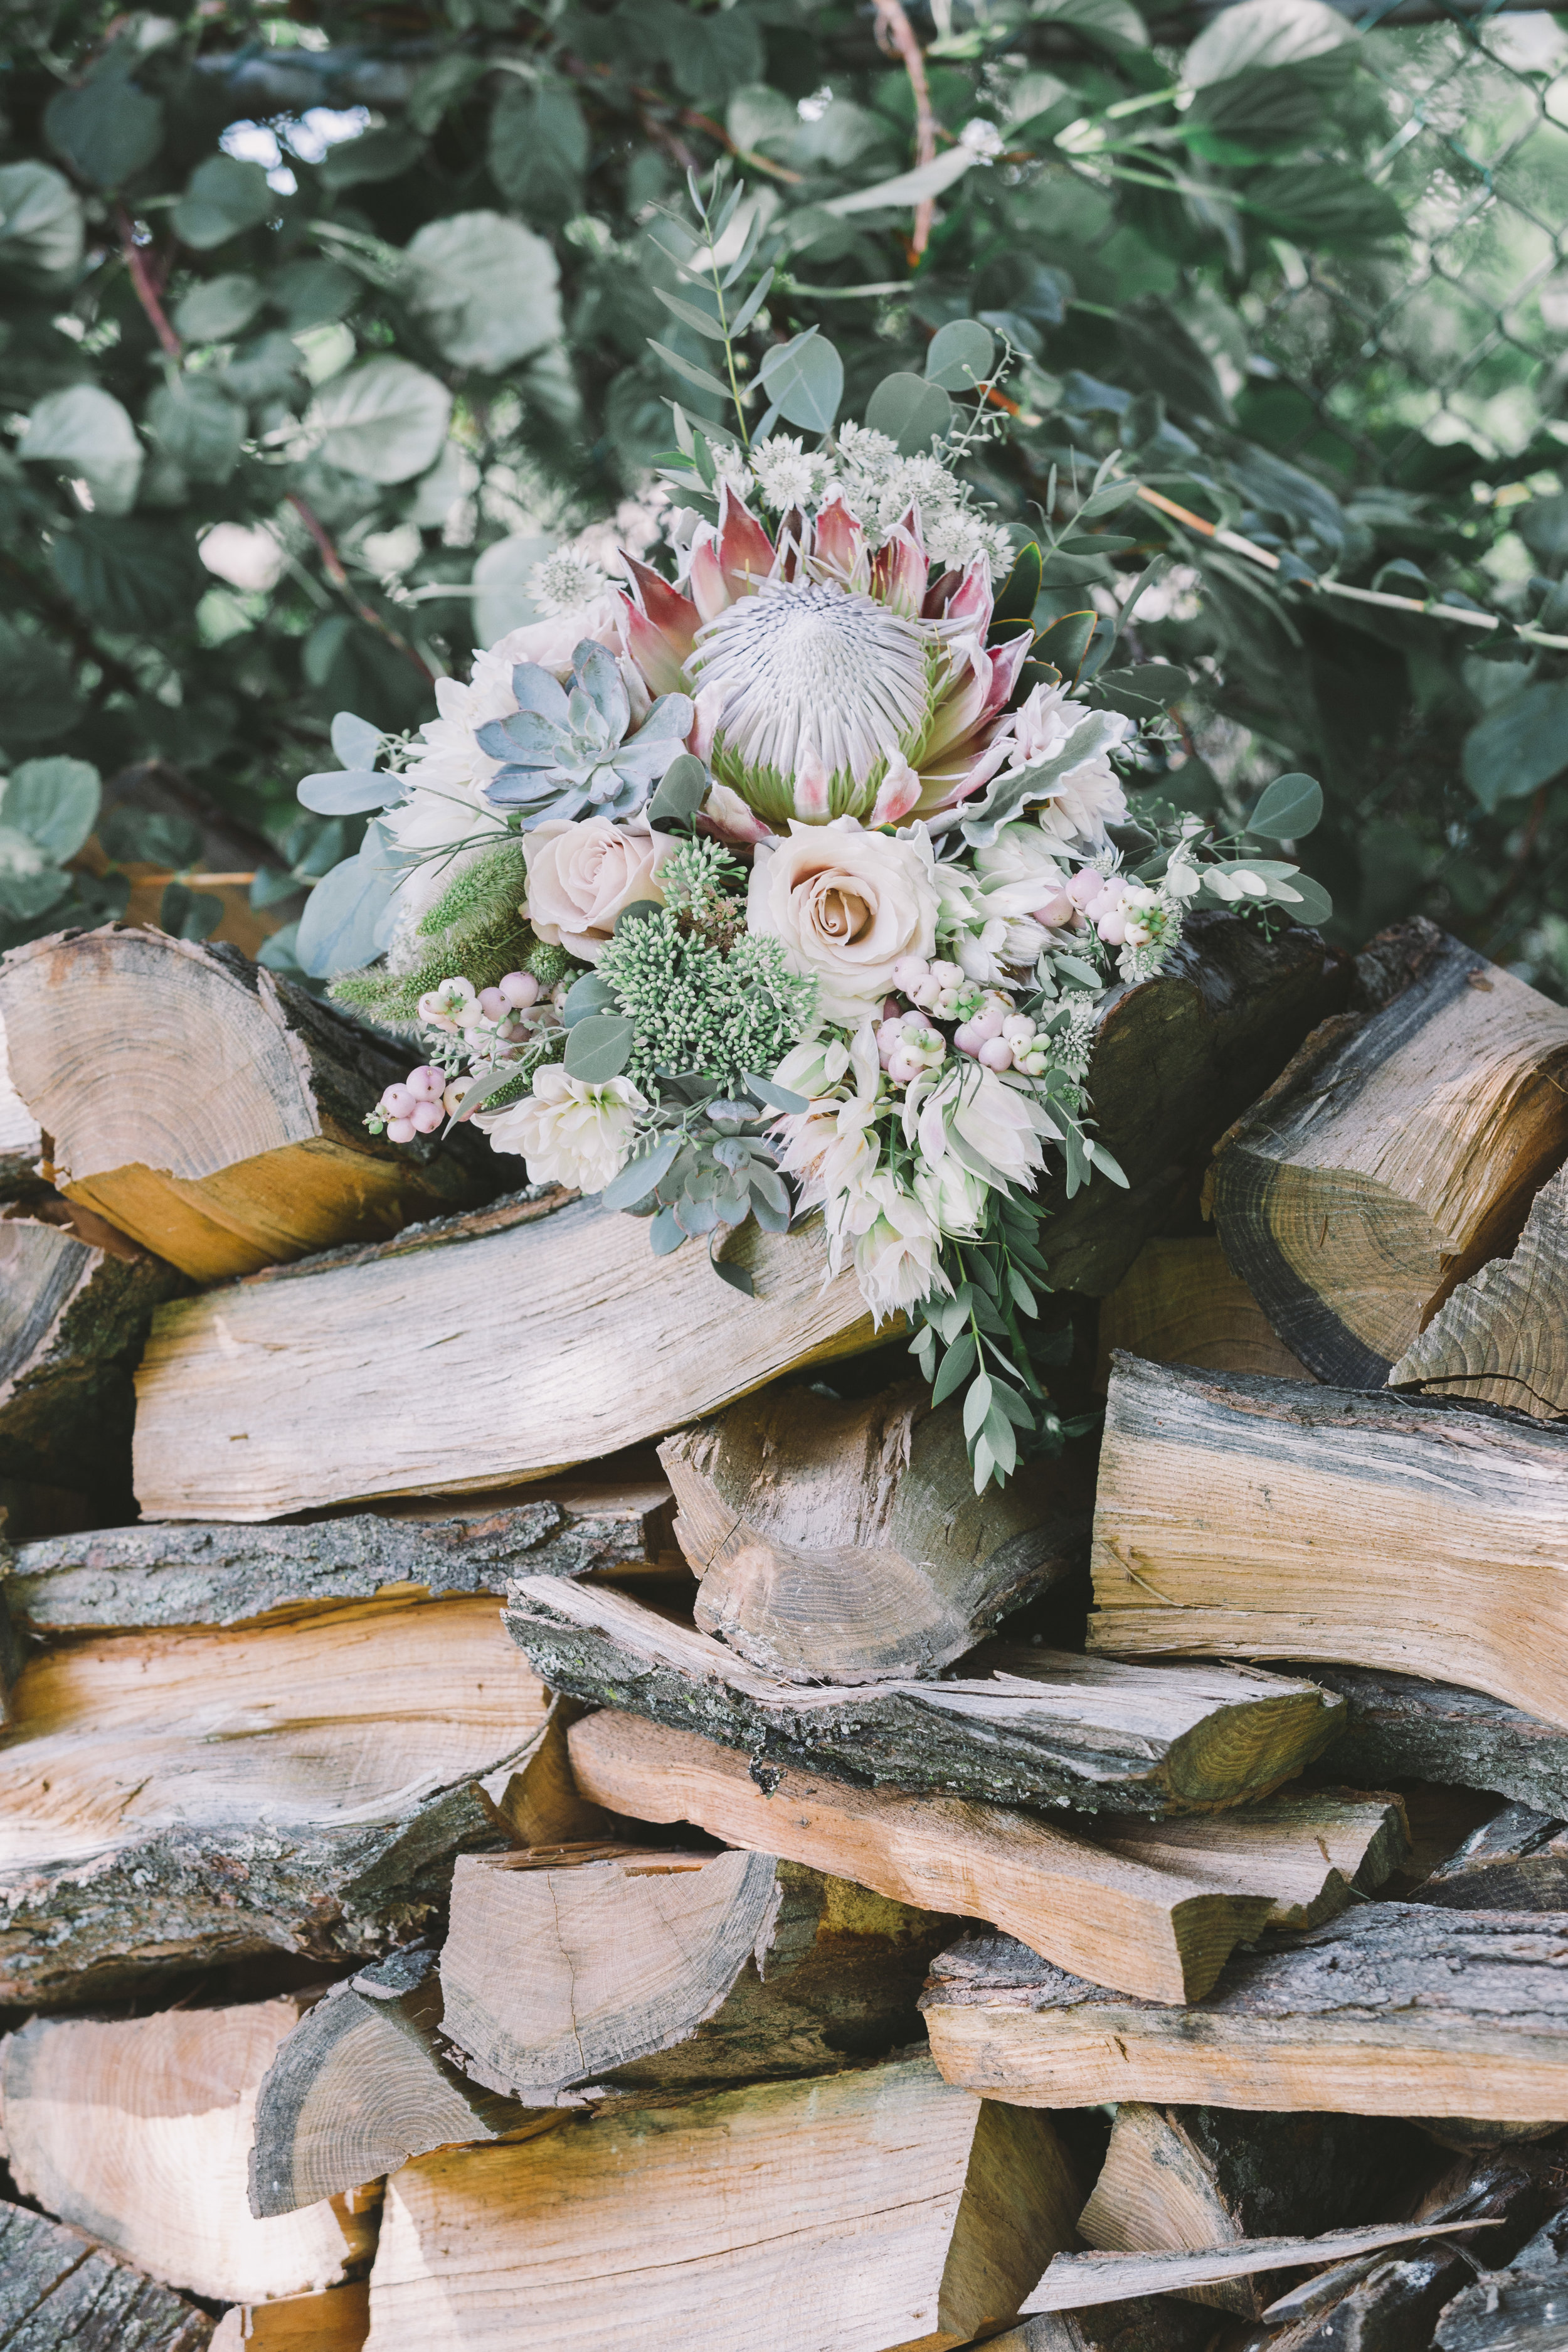 Bridal Bouquet on Wood Pile